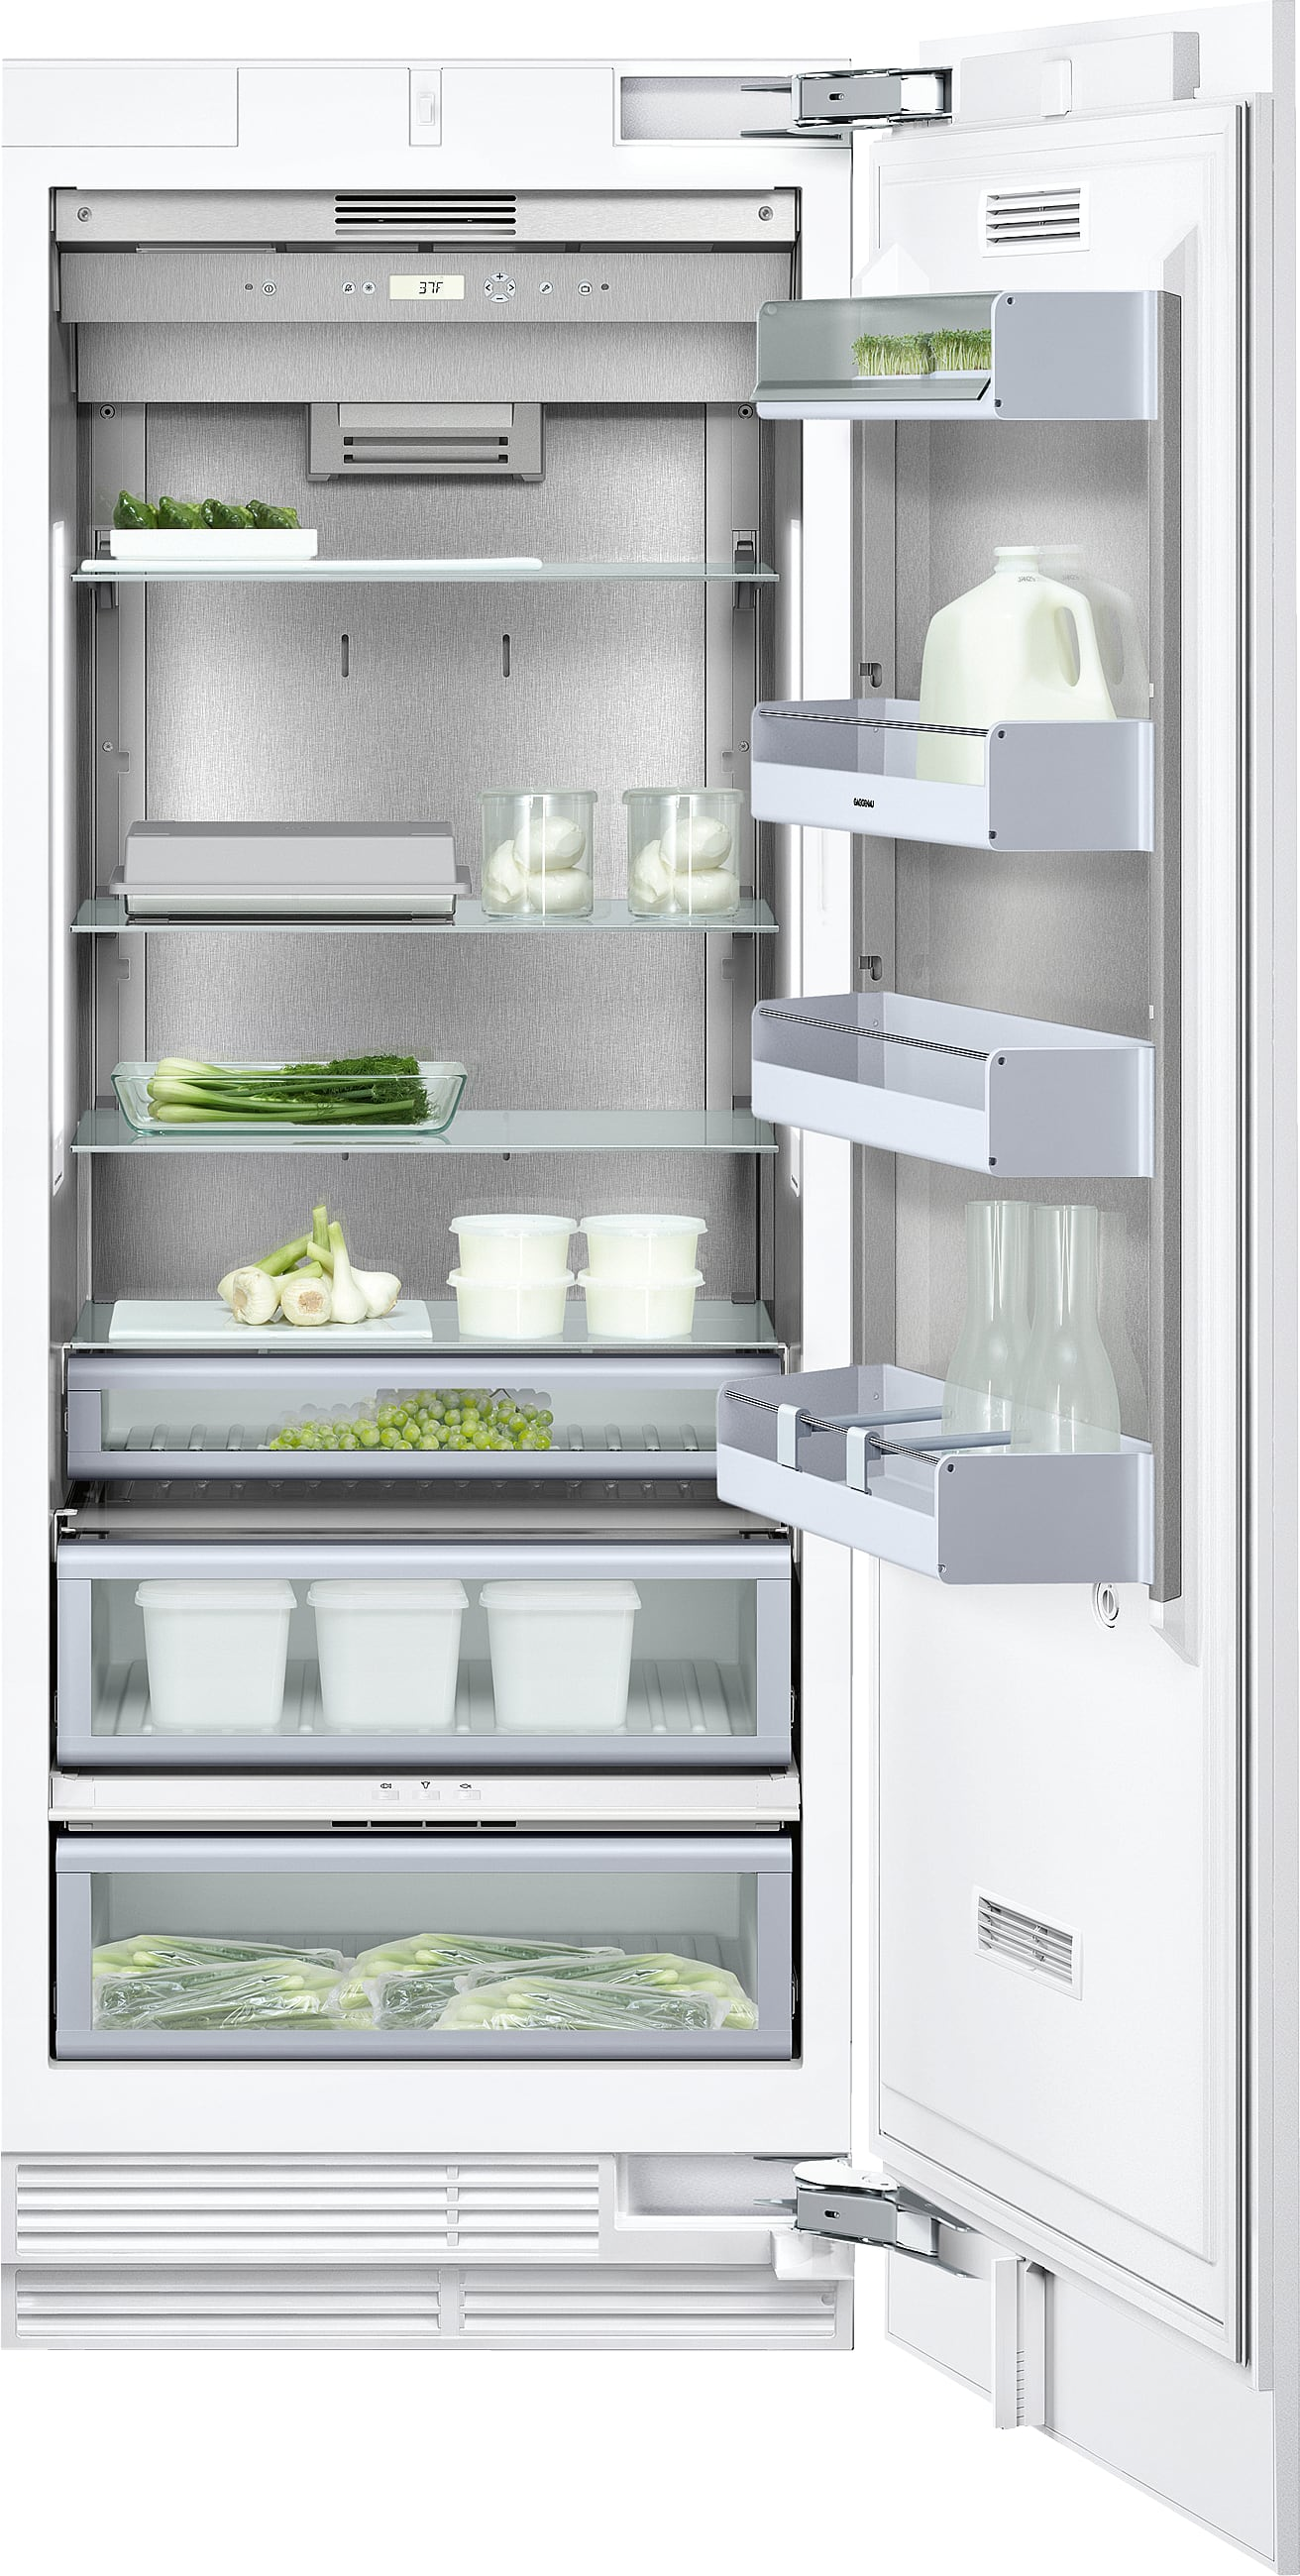 gaggenau rf461701 24 inch built in freezer column with. Black Bedroom Furniture Sets. Home Design Ideas